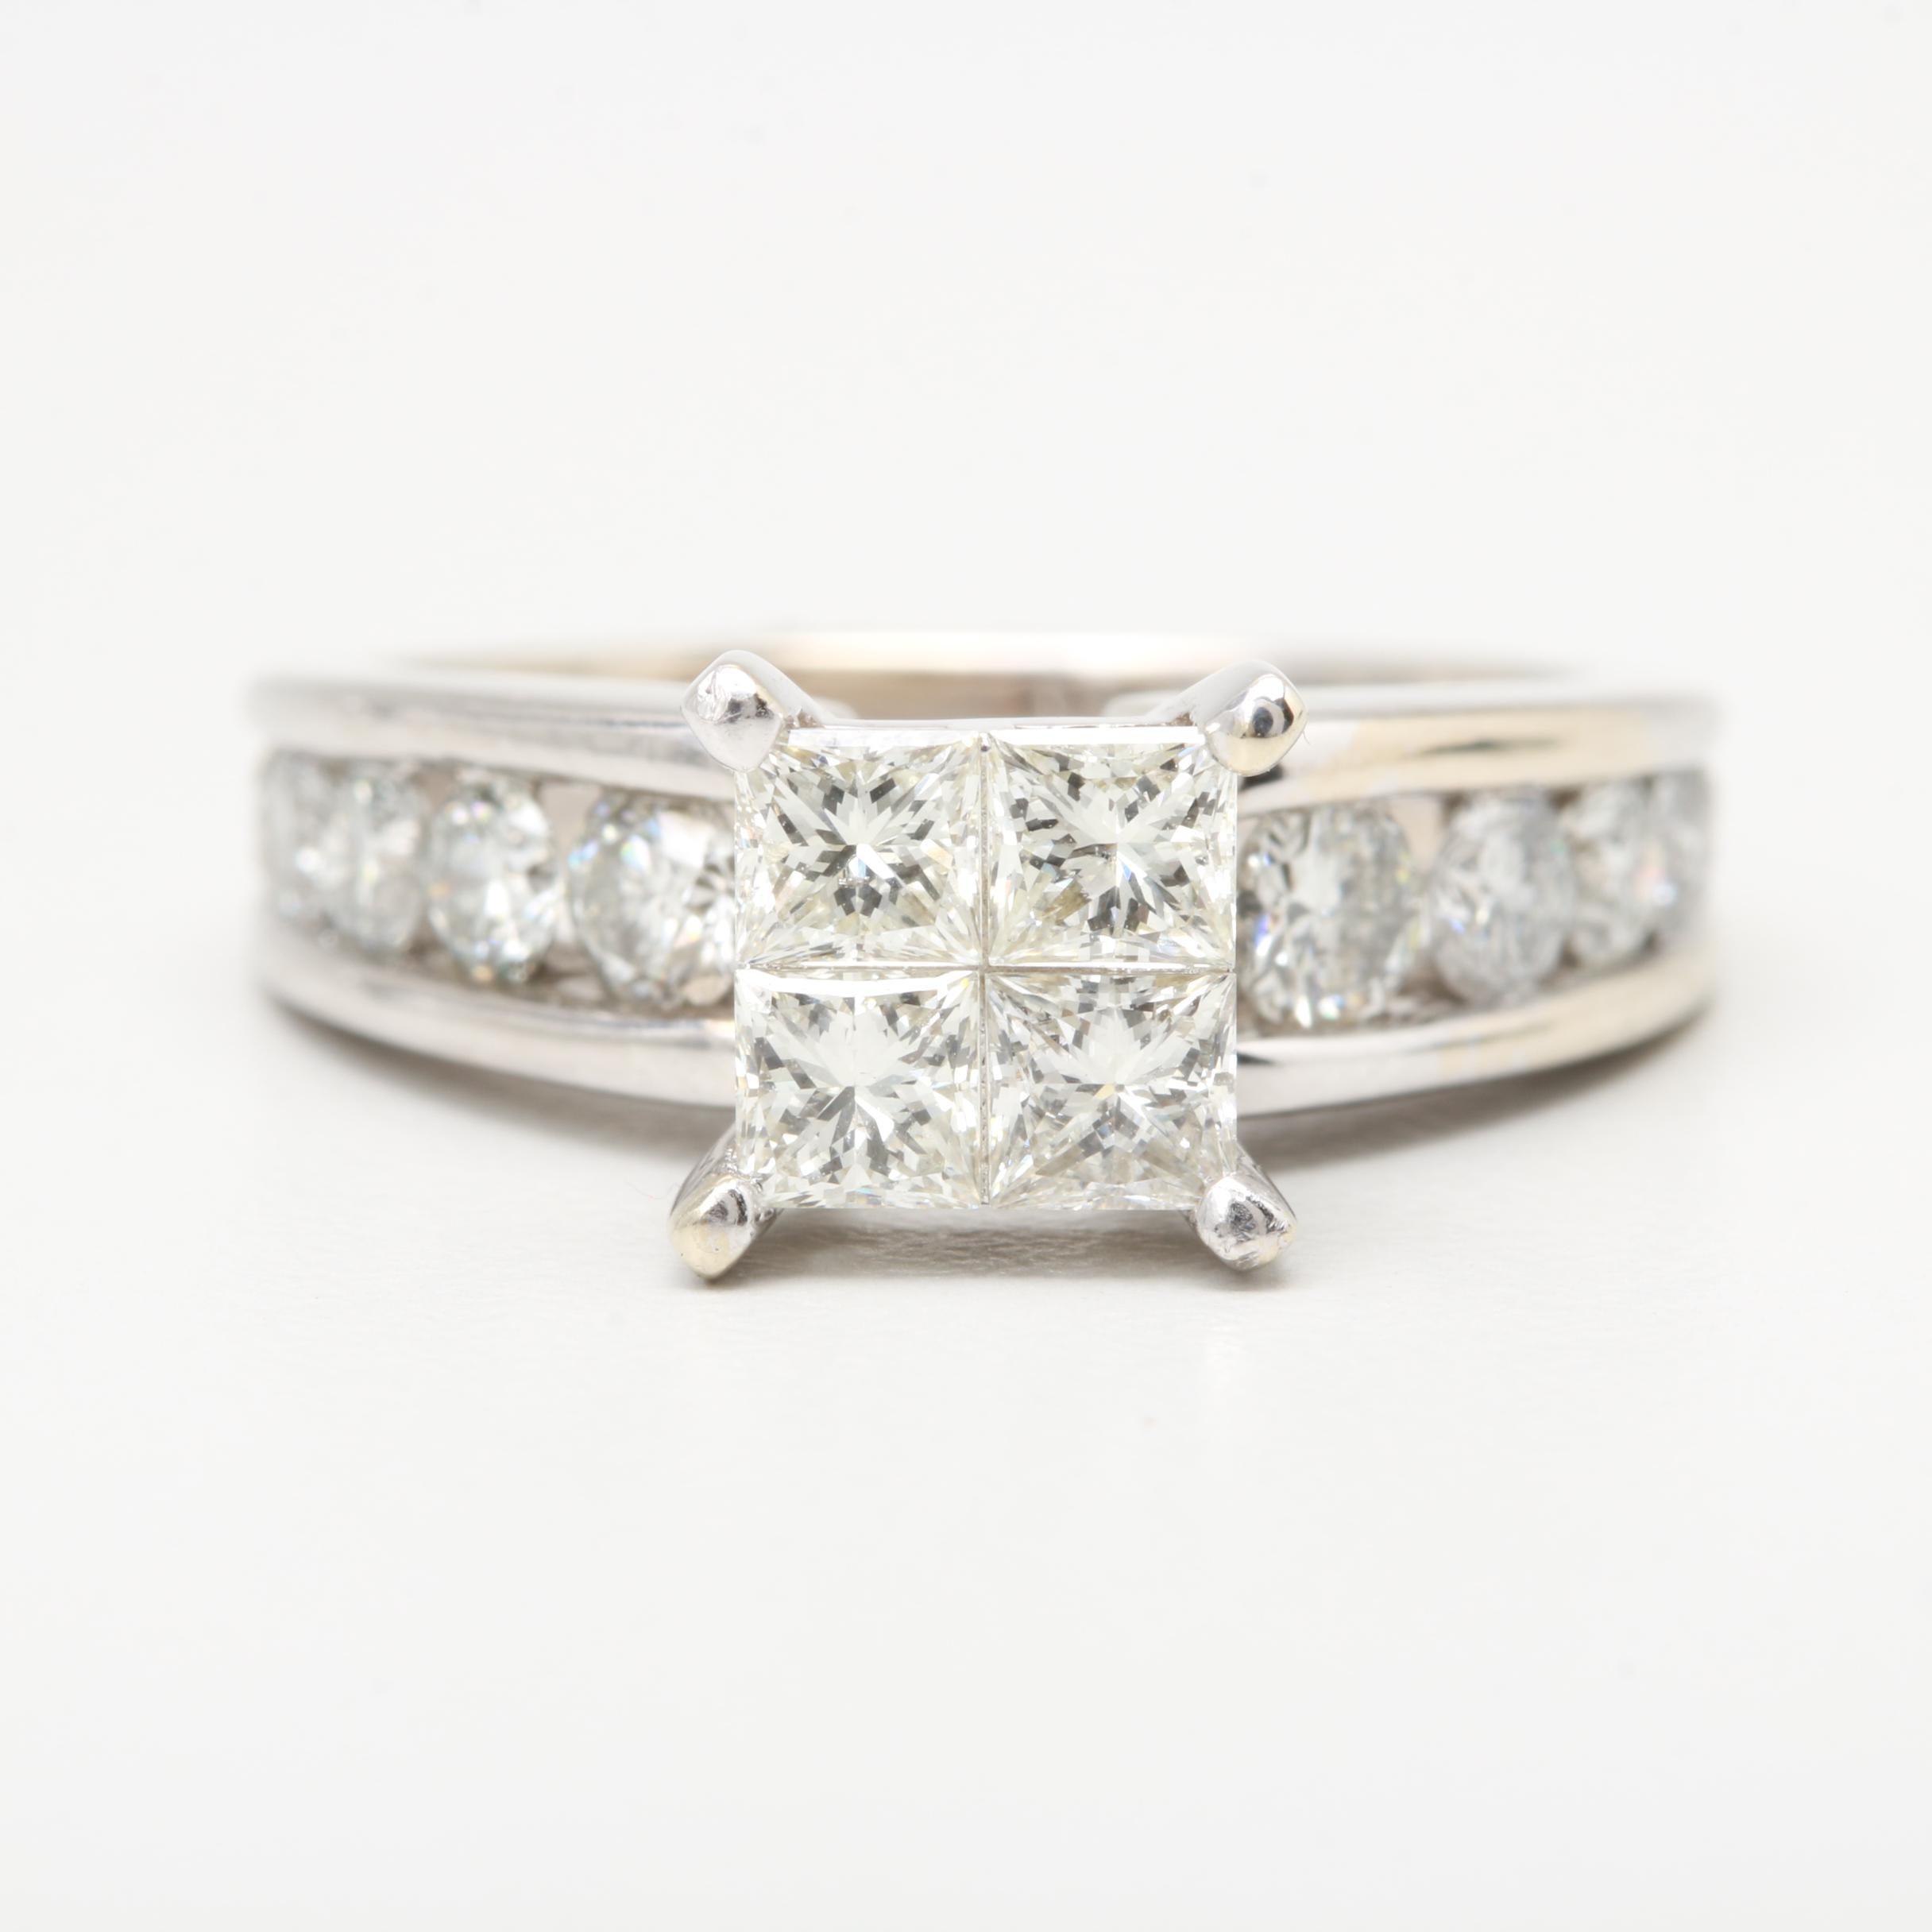 14K White Gold 1.80 CTW Diamond Ring